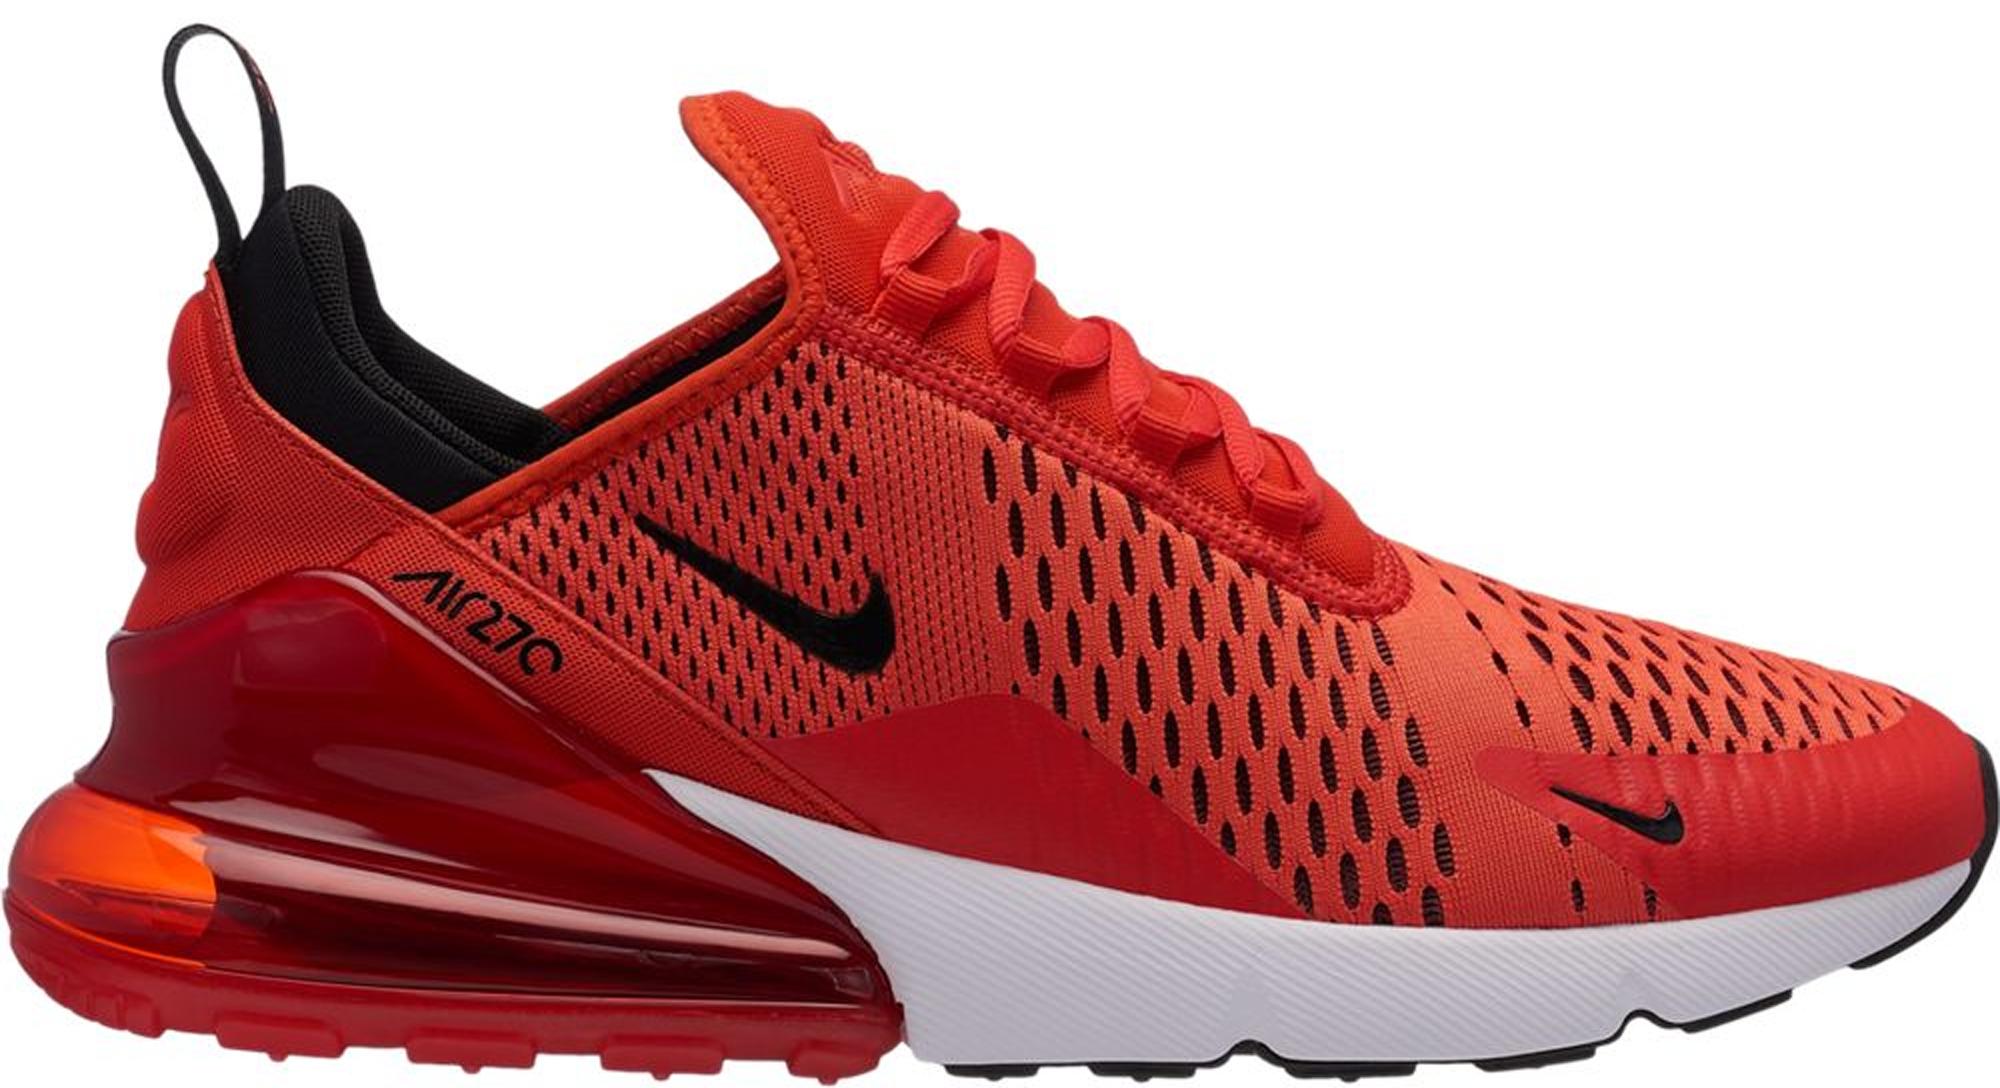 Nike Air Max 270 Habanero Red